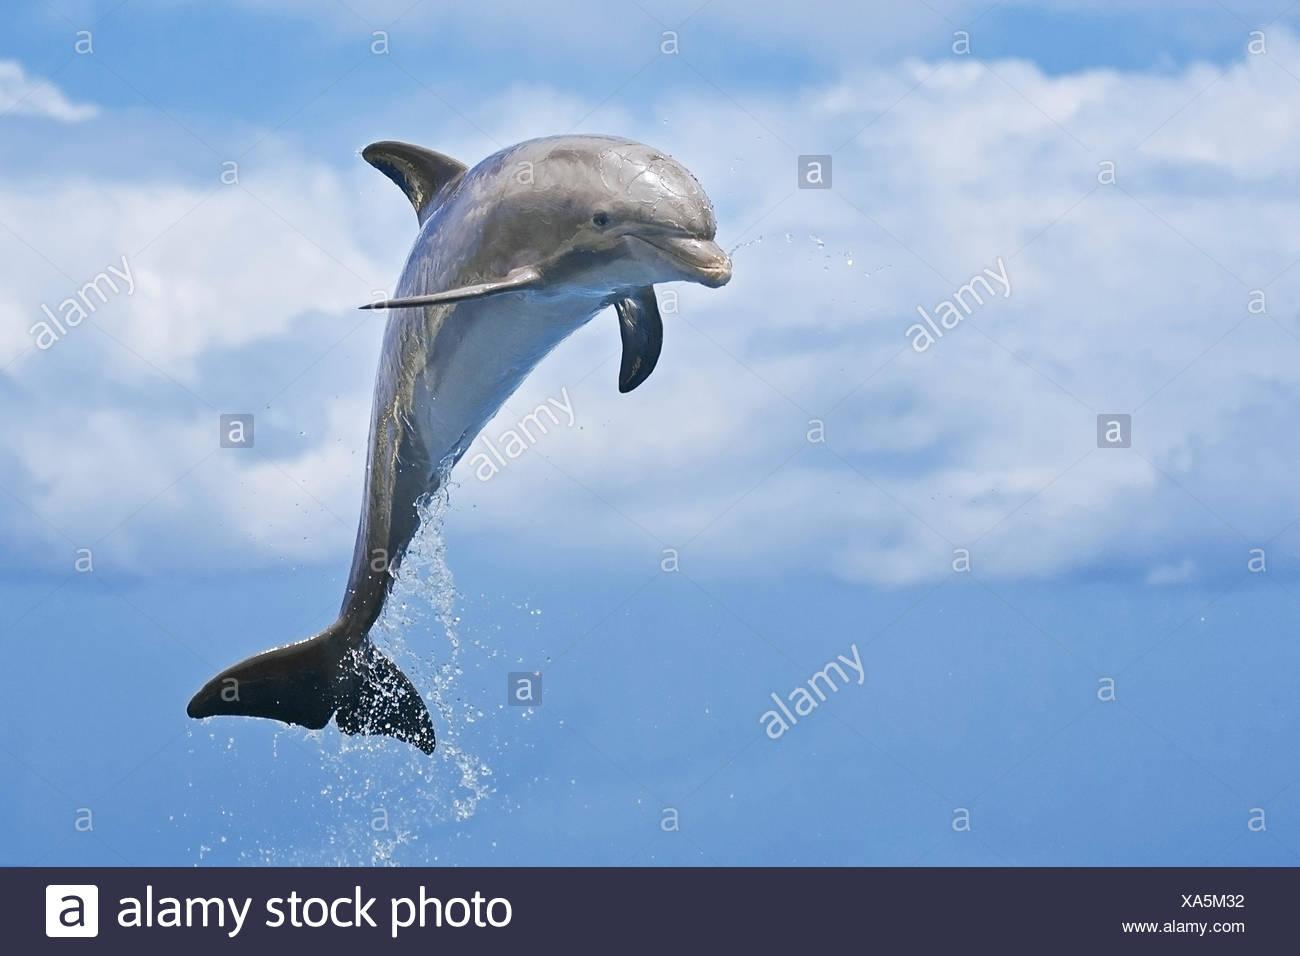 Juvenile Bottlenose Dolphin, Tursiops truncatus, Caribbean, Bahamas Stock Photo